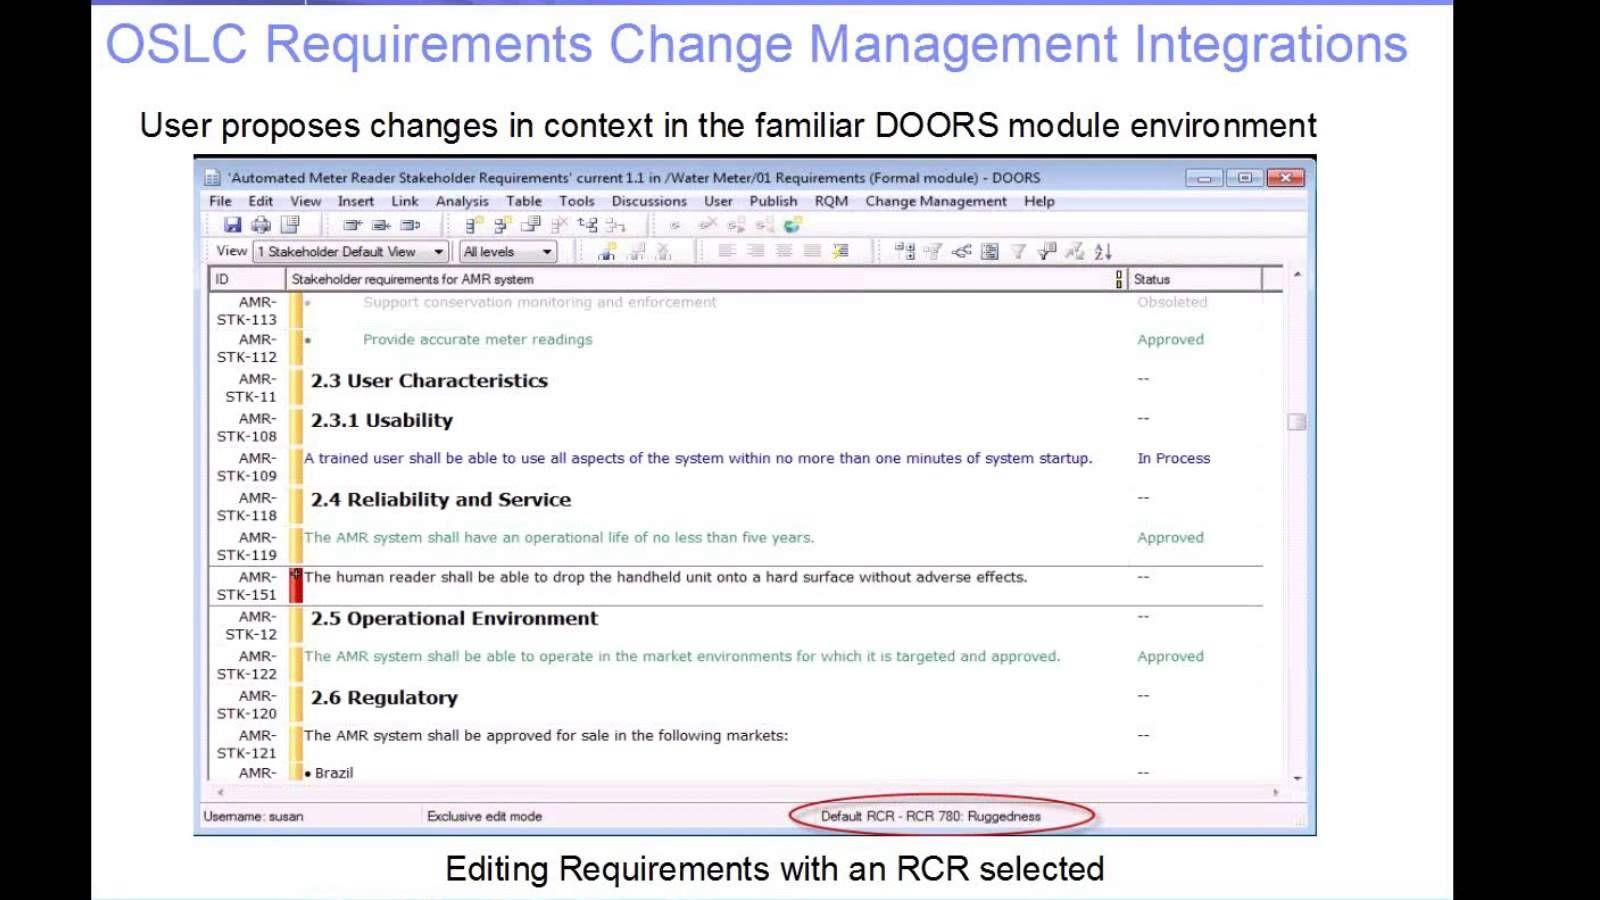 Rational DOORS v9 x Requirements Change Management Options  sc 1 st  Pinterest & Rational DOORS v9 x: Requirements Change Management Options | IBM ... pezcame.com